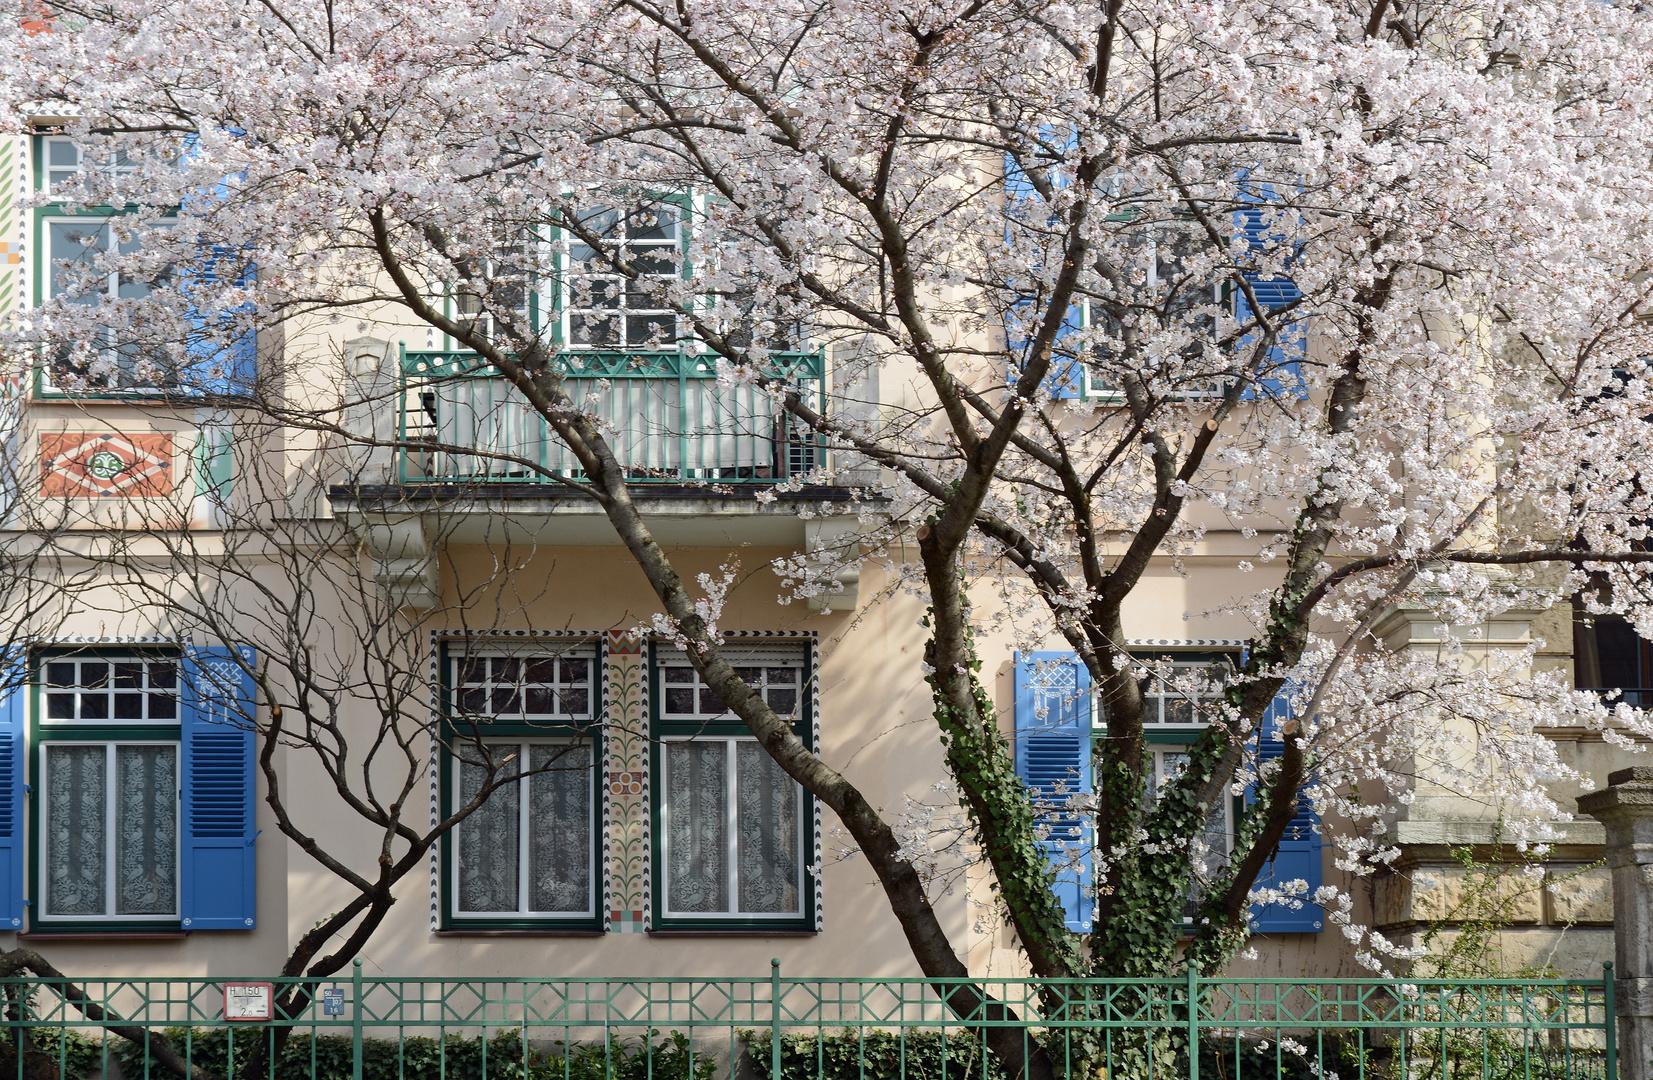 Frühling in Schwabing